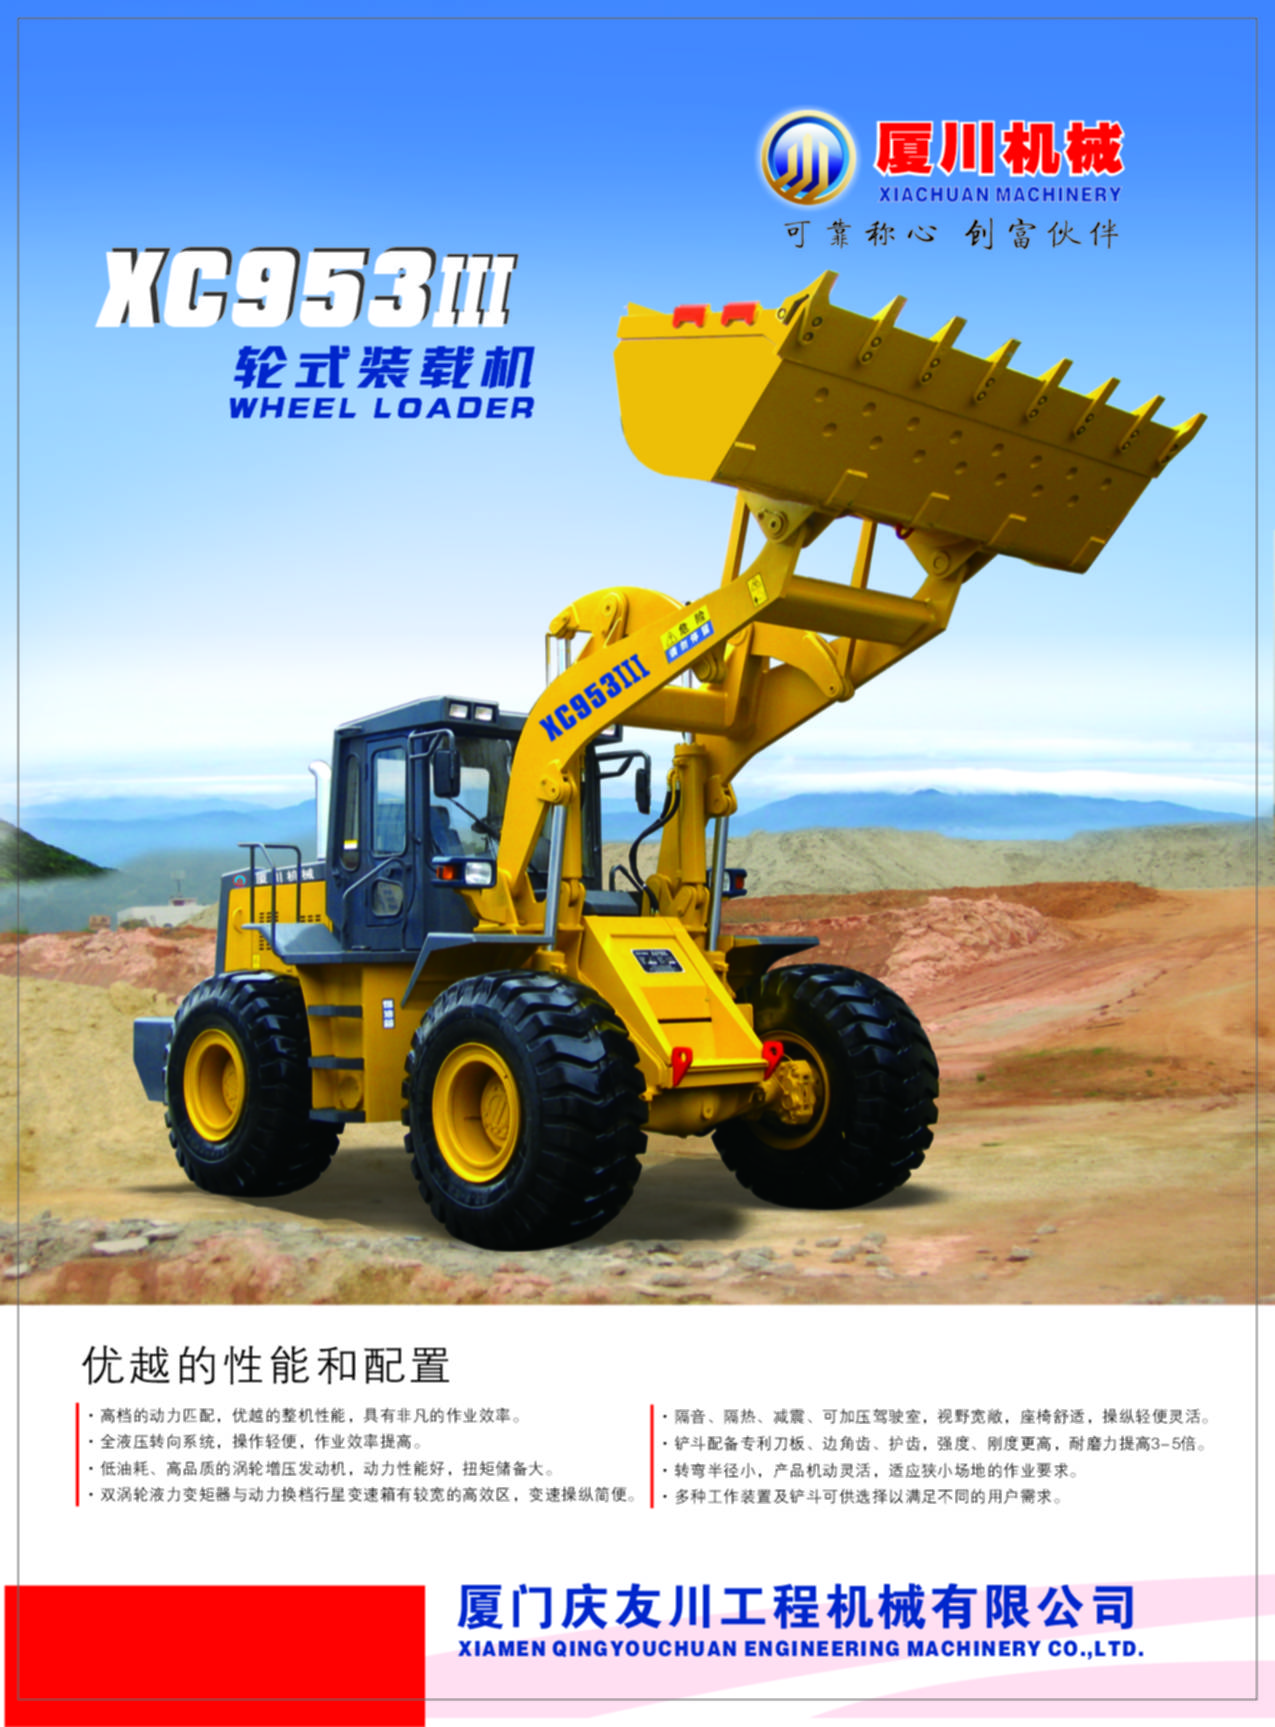 XC953III正面.jpg